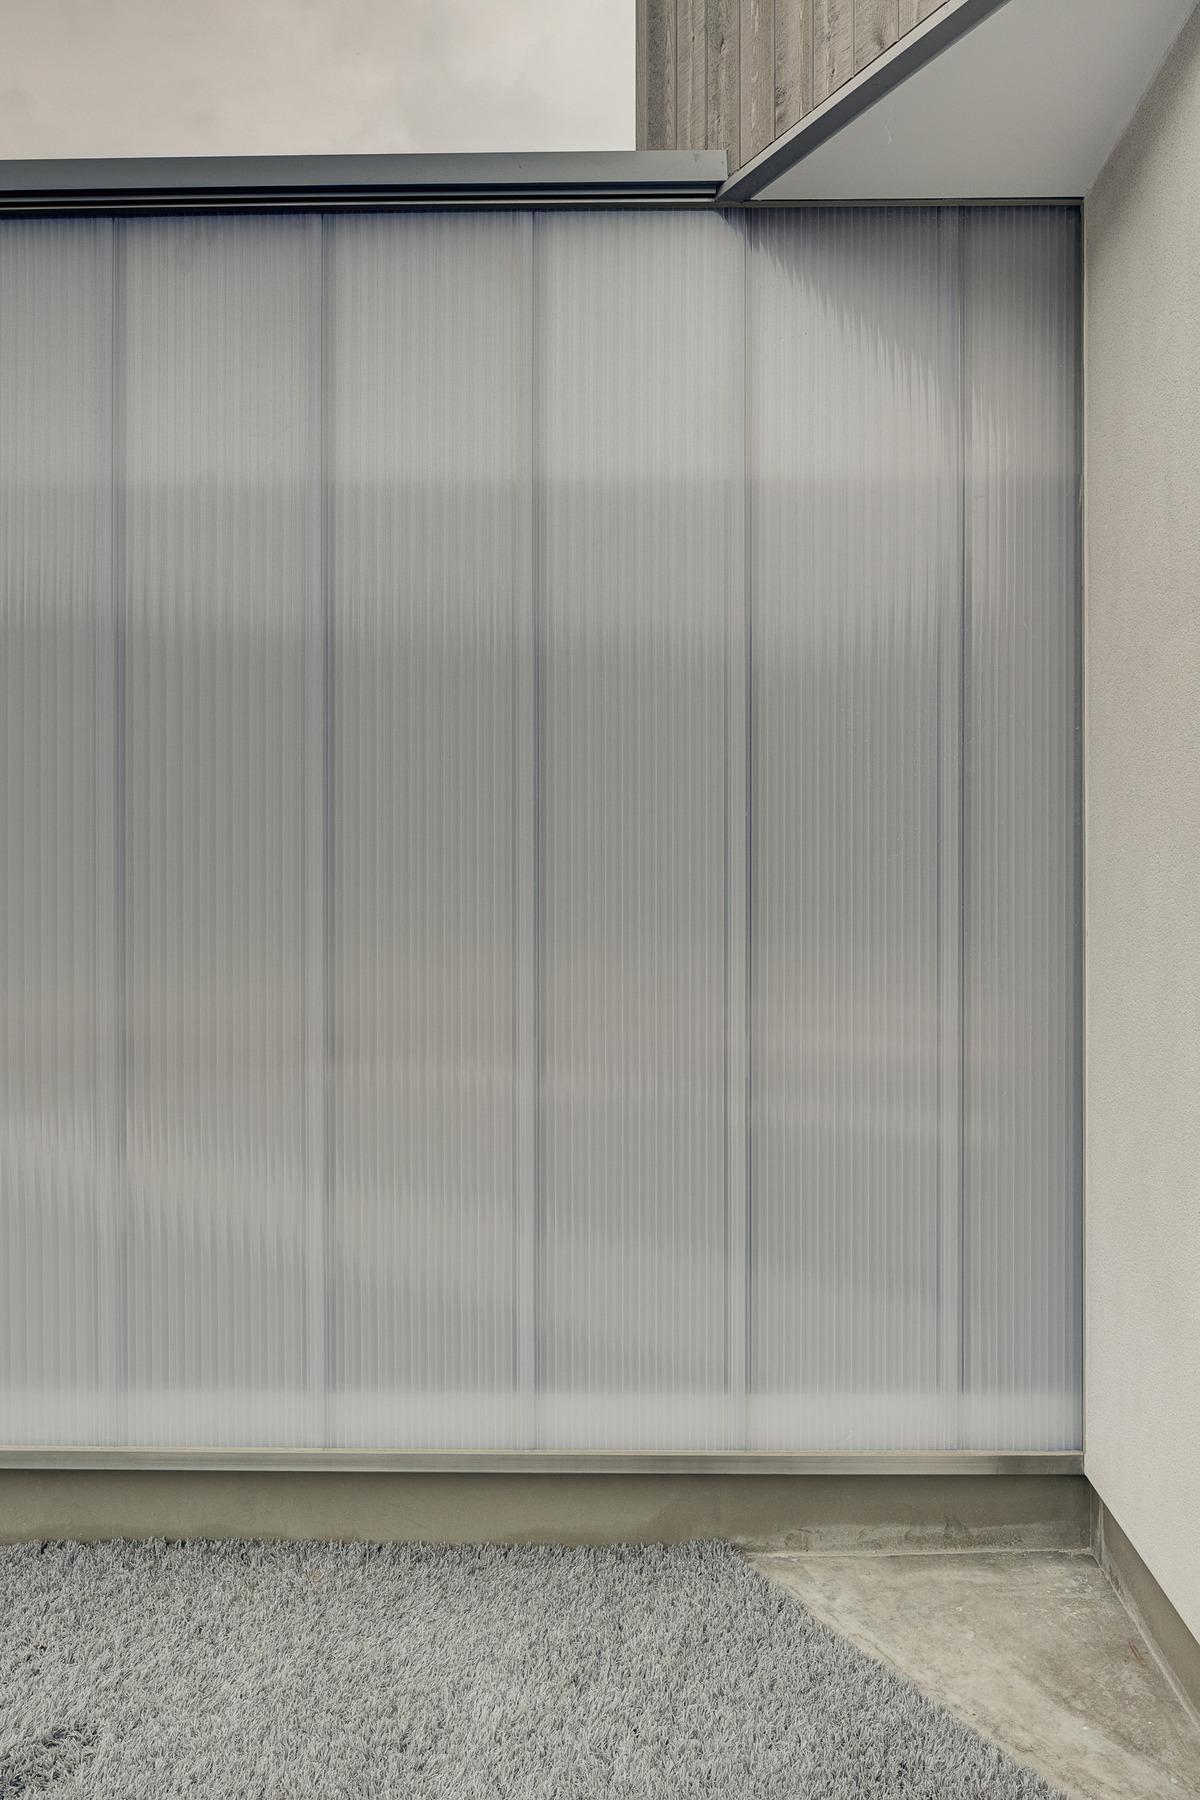 Orandajima House exterior detail view of polycarbonate panel